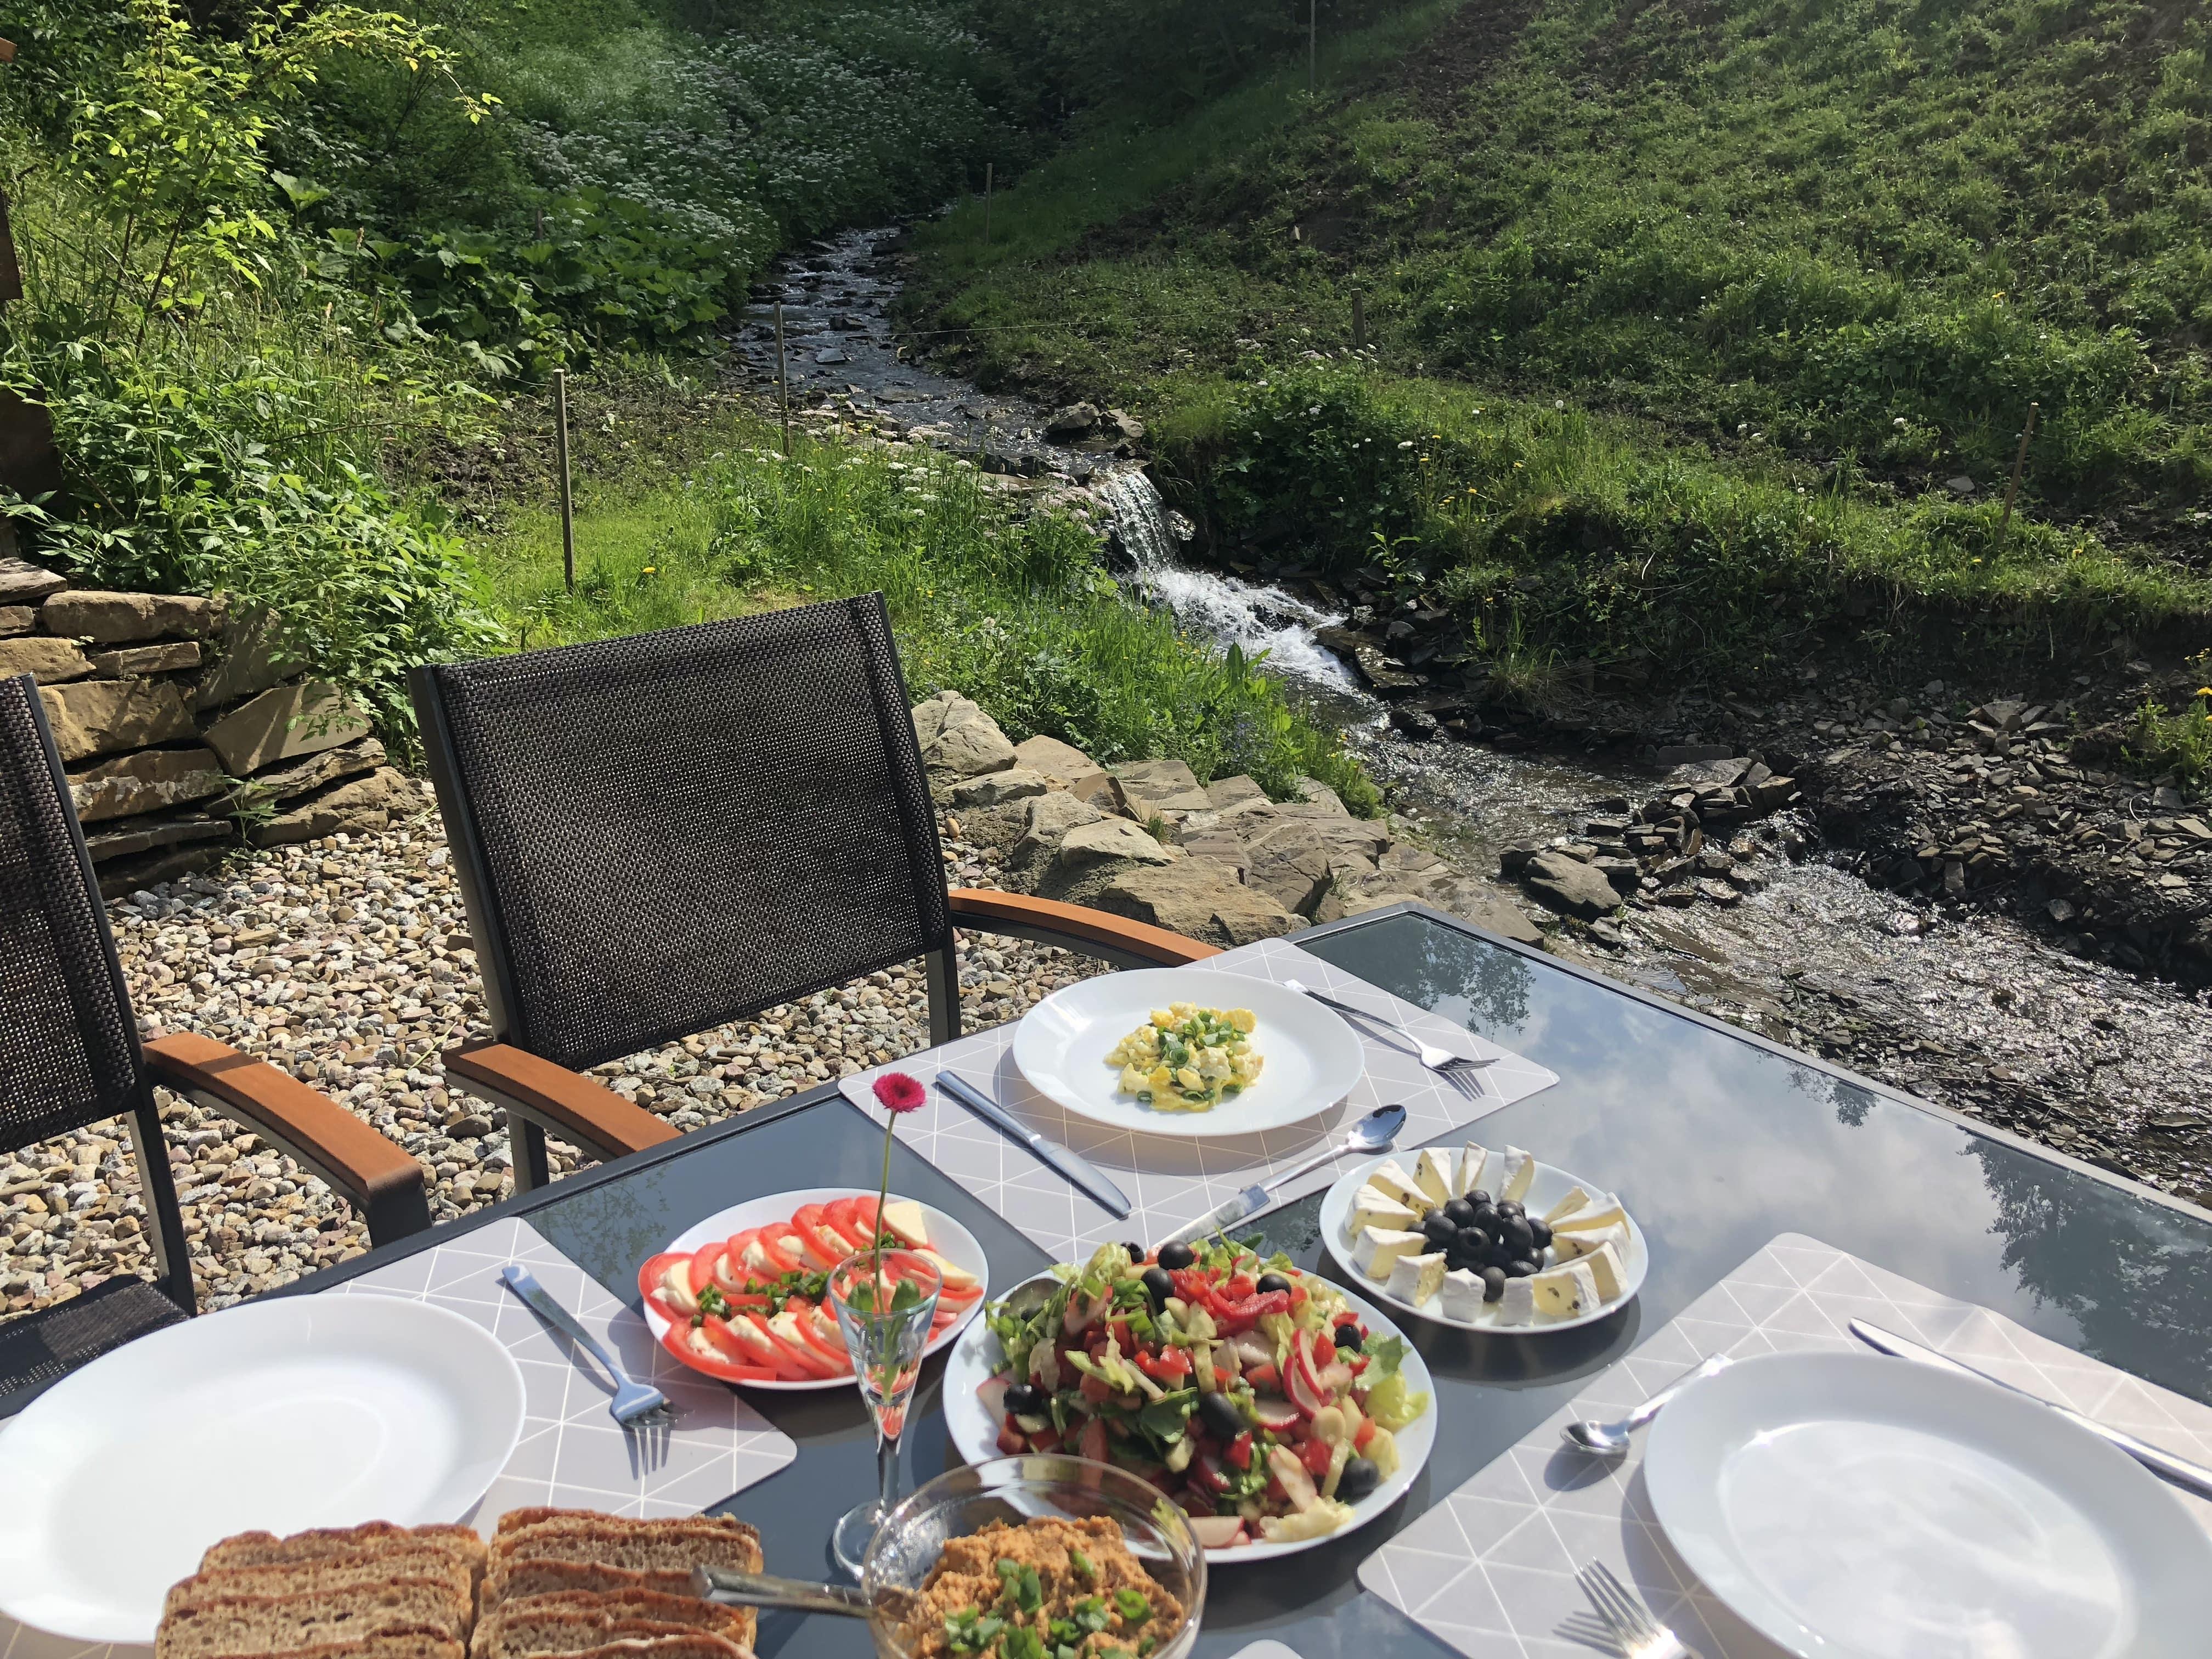 Chatta Łapszanka - What will I eat?